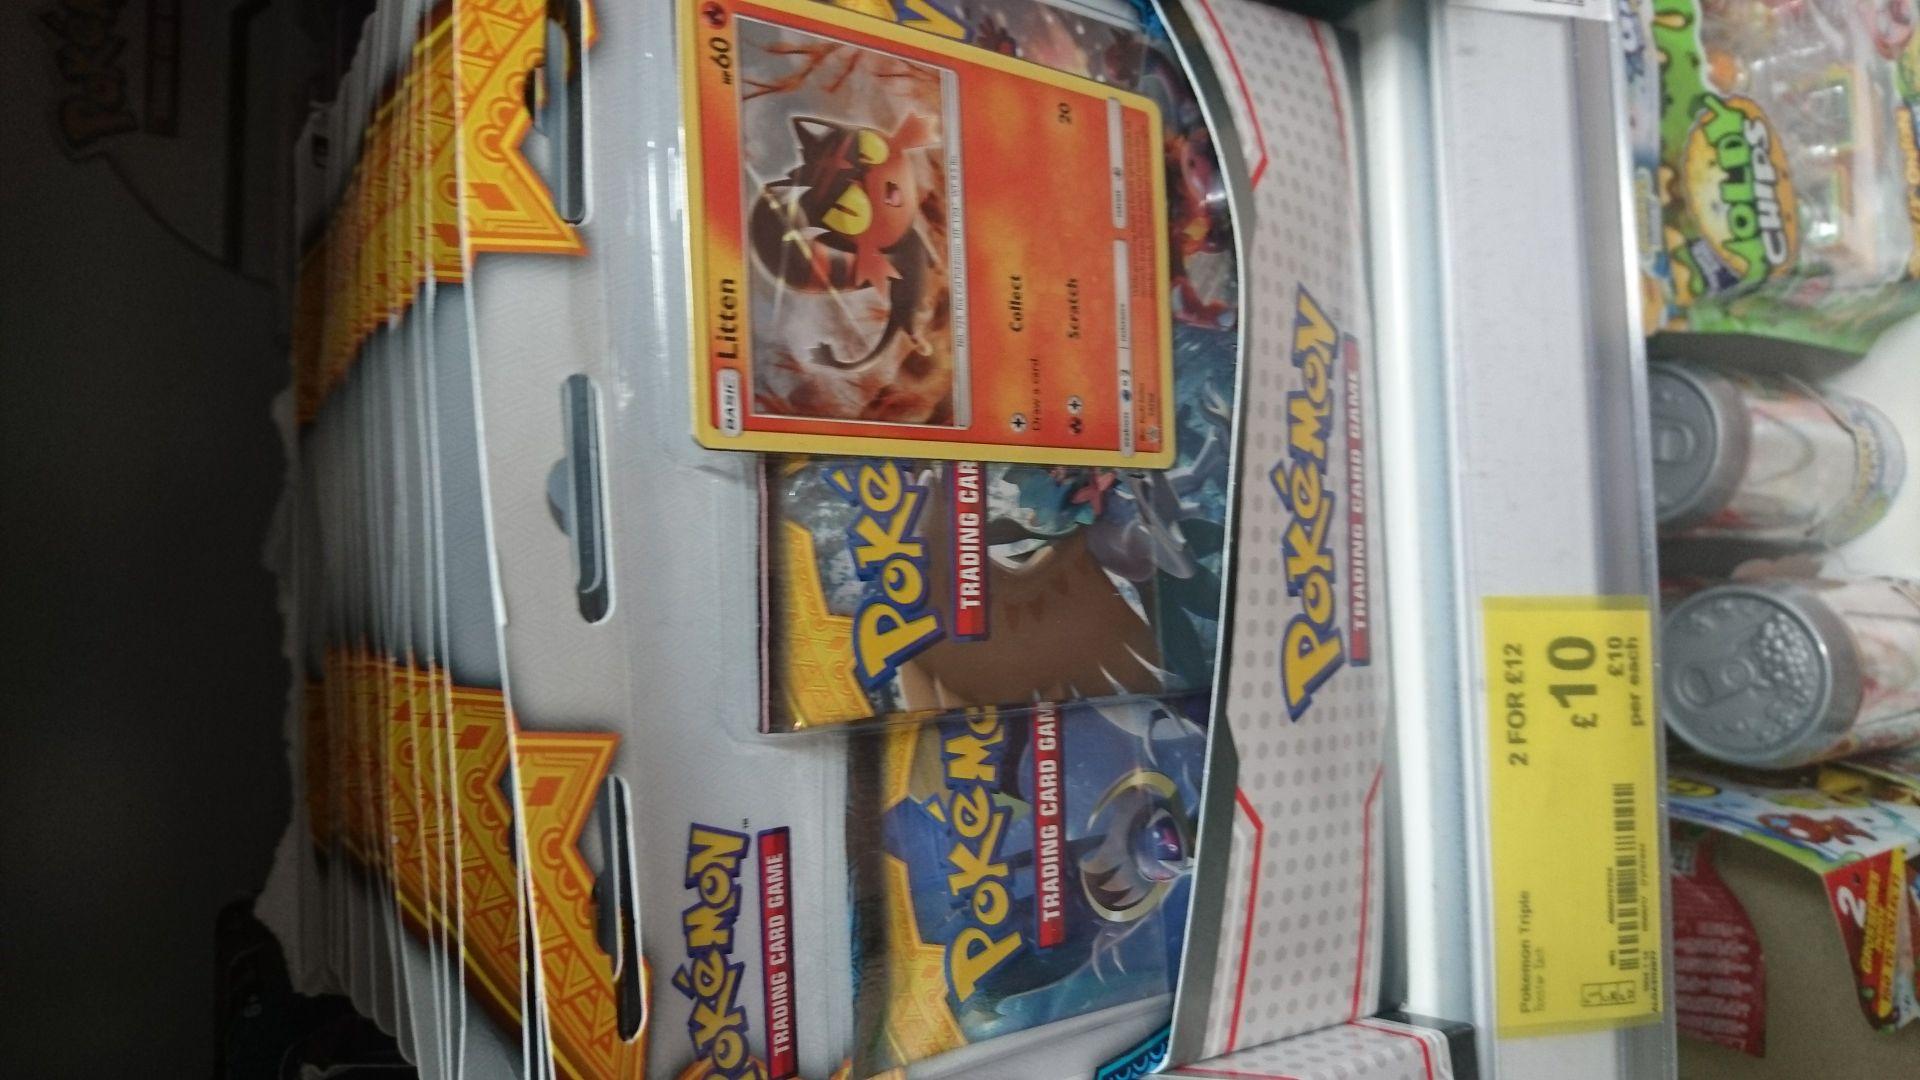 Pokemon TCG cards 2 for £12  @ Asda Trafford Center